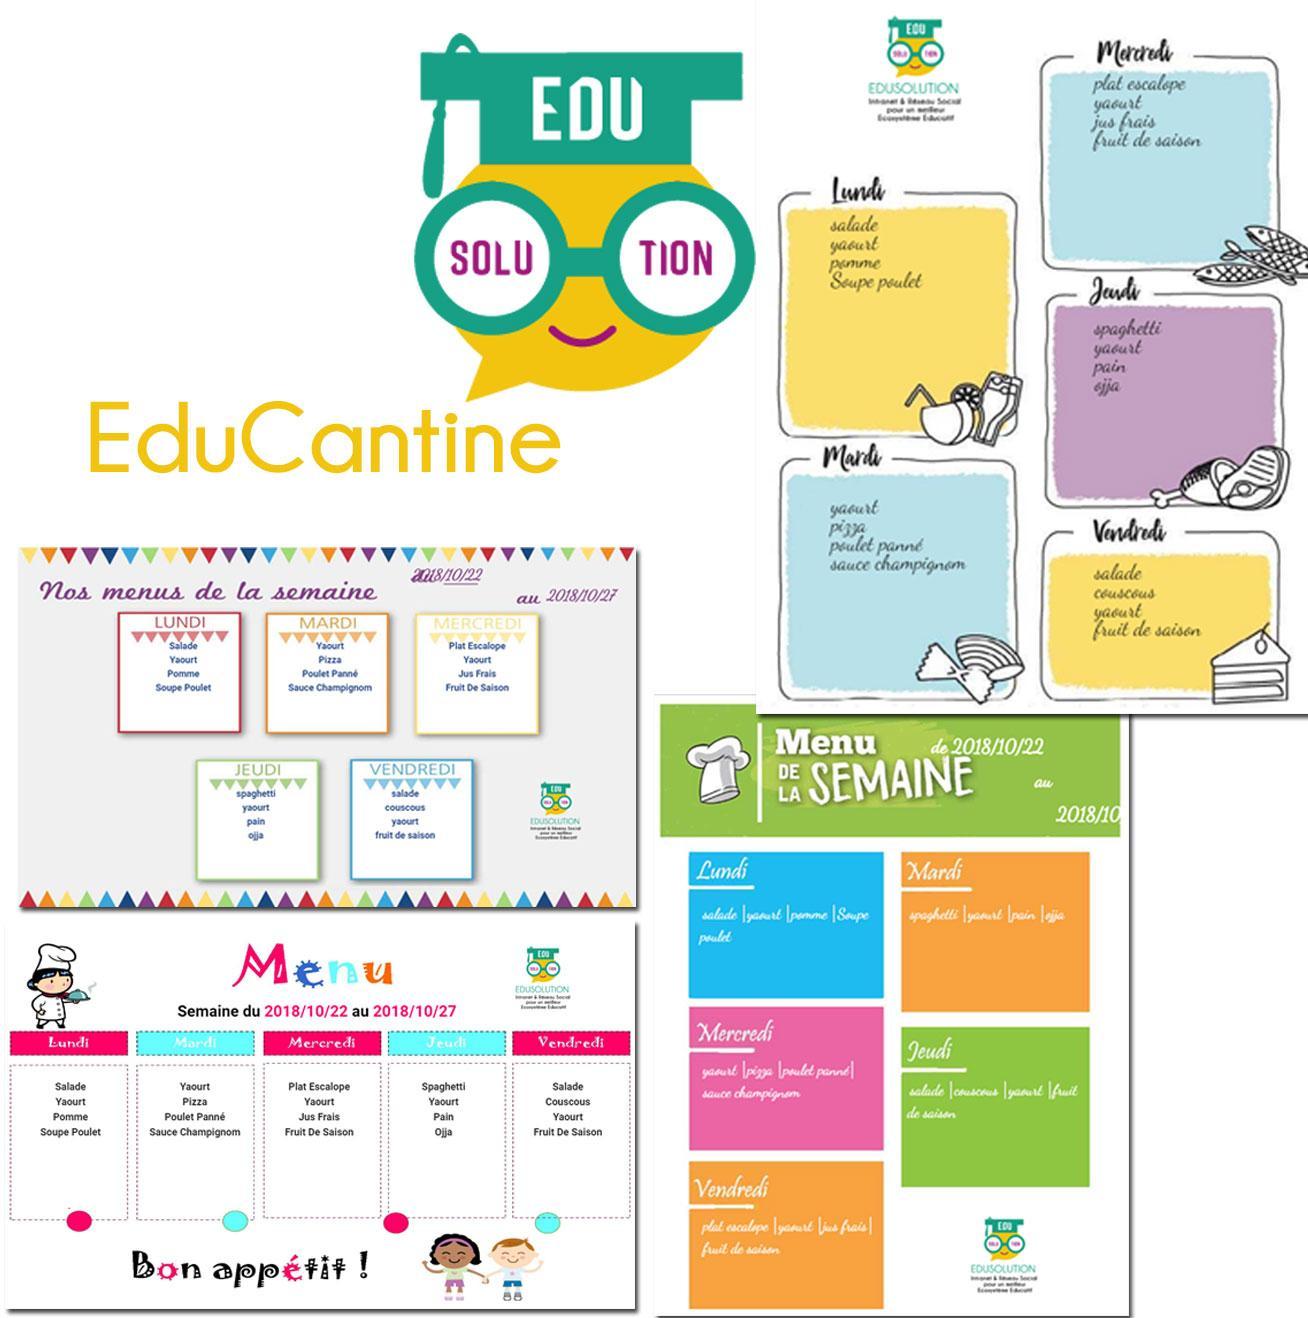 edu-cantine-generator-school.jpg